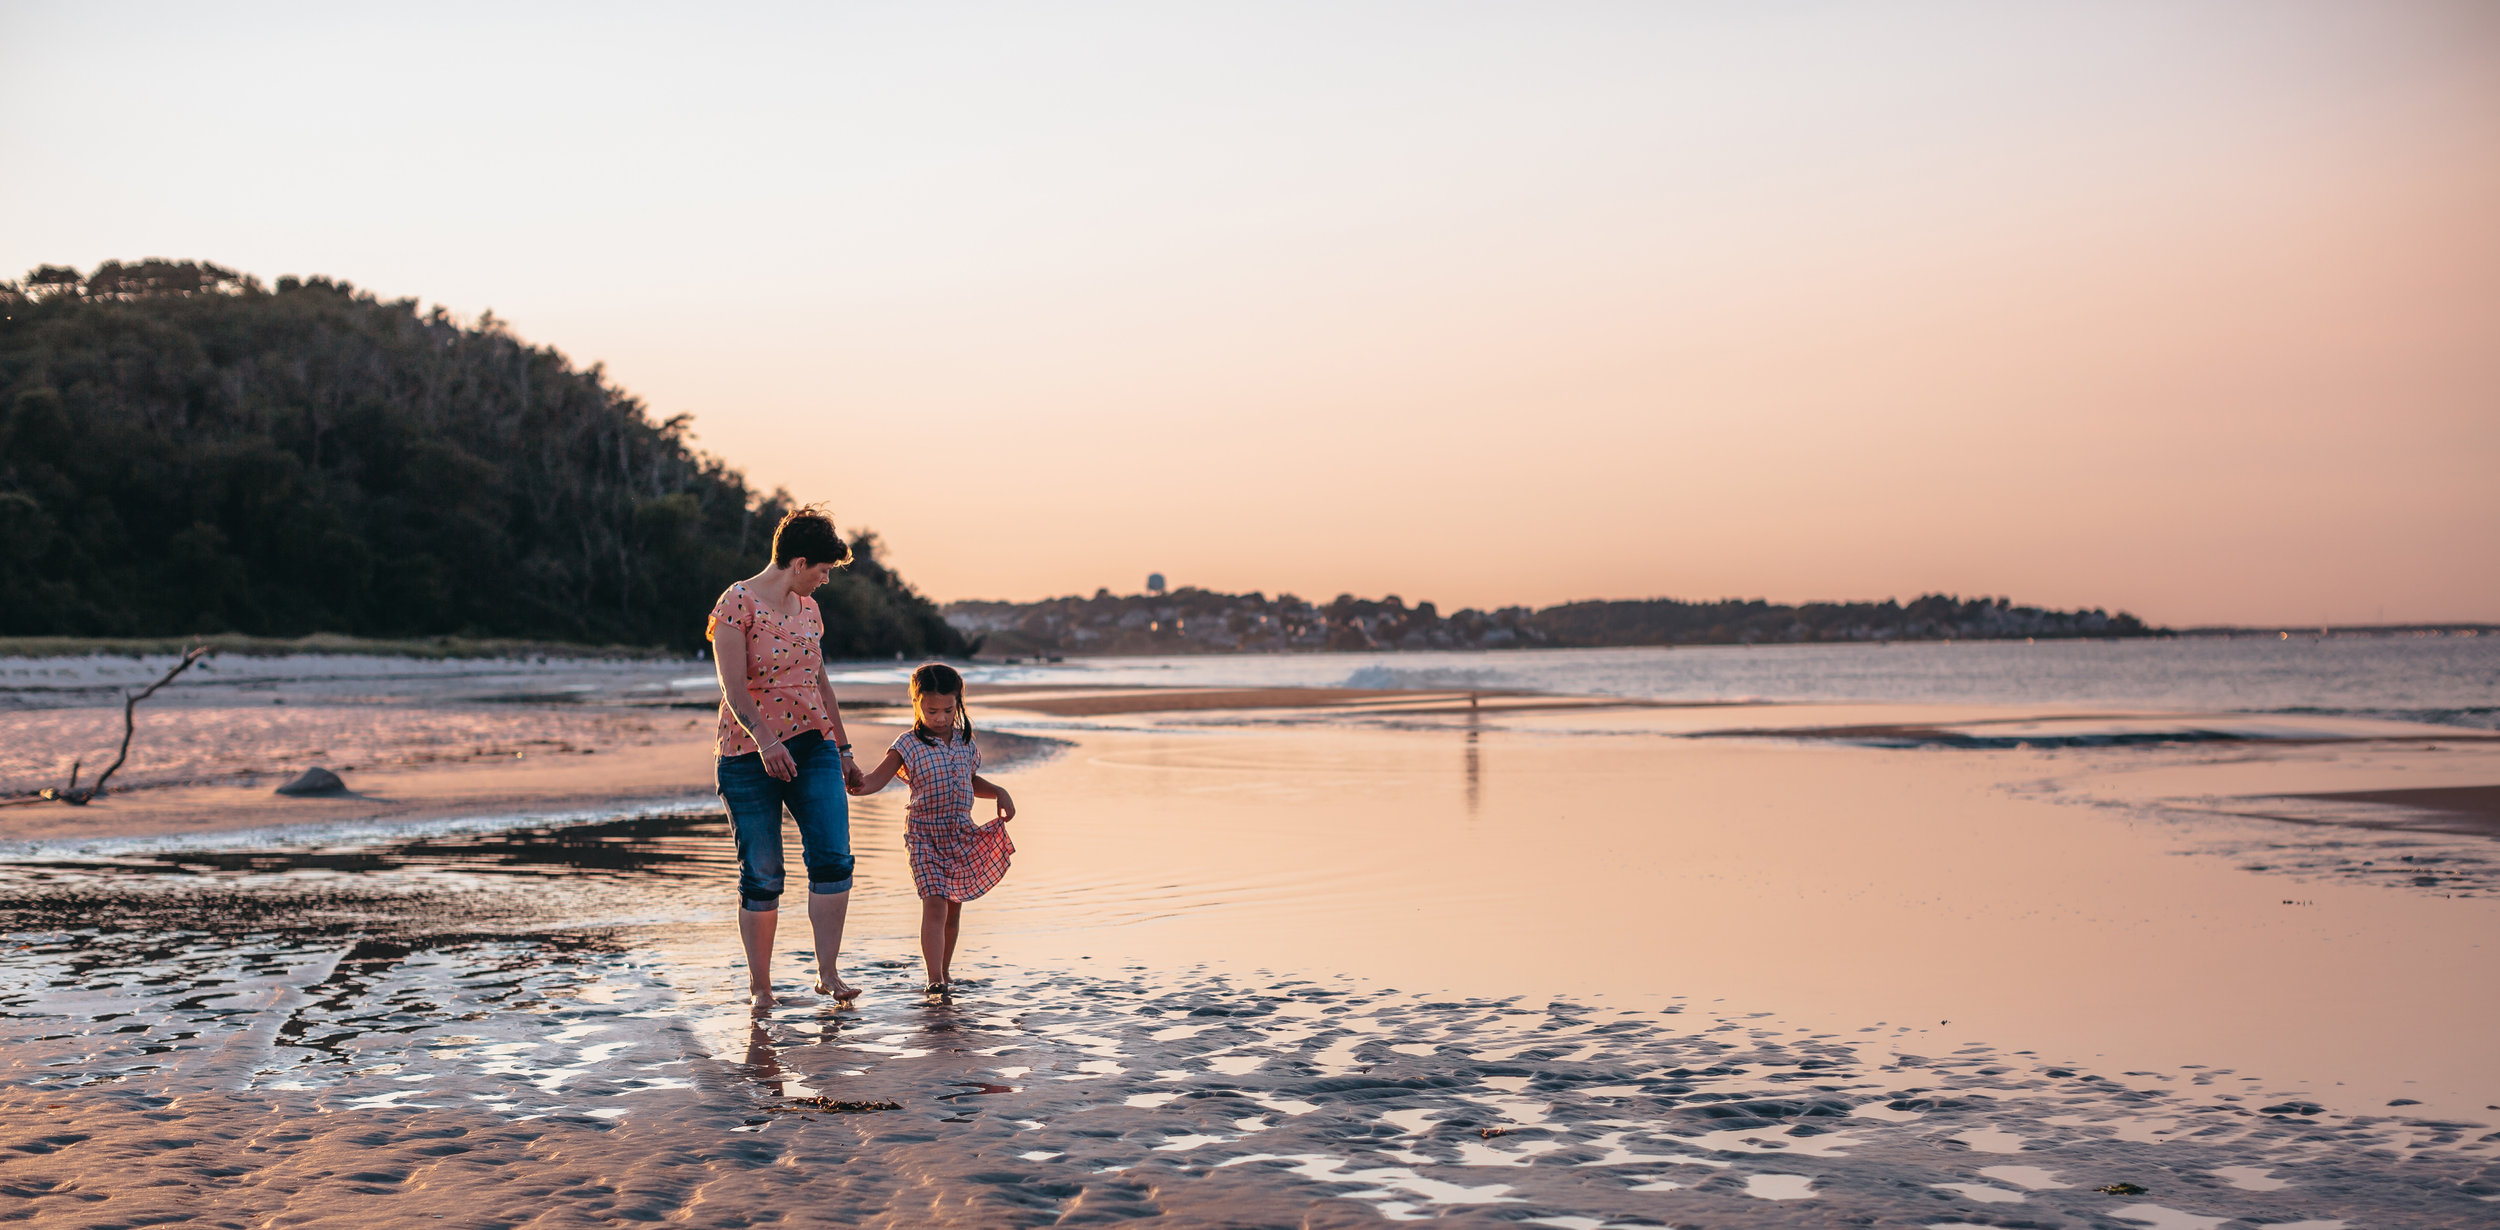 sunset-beach-family-photos-boston-family-photographer-joy-leduc.jpg